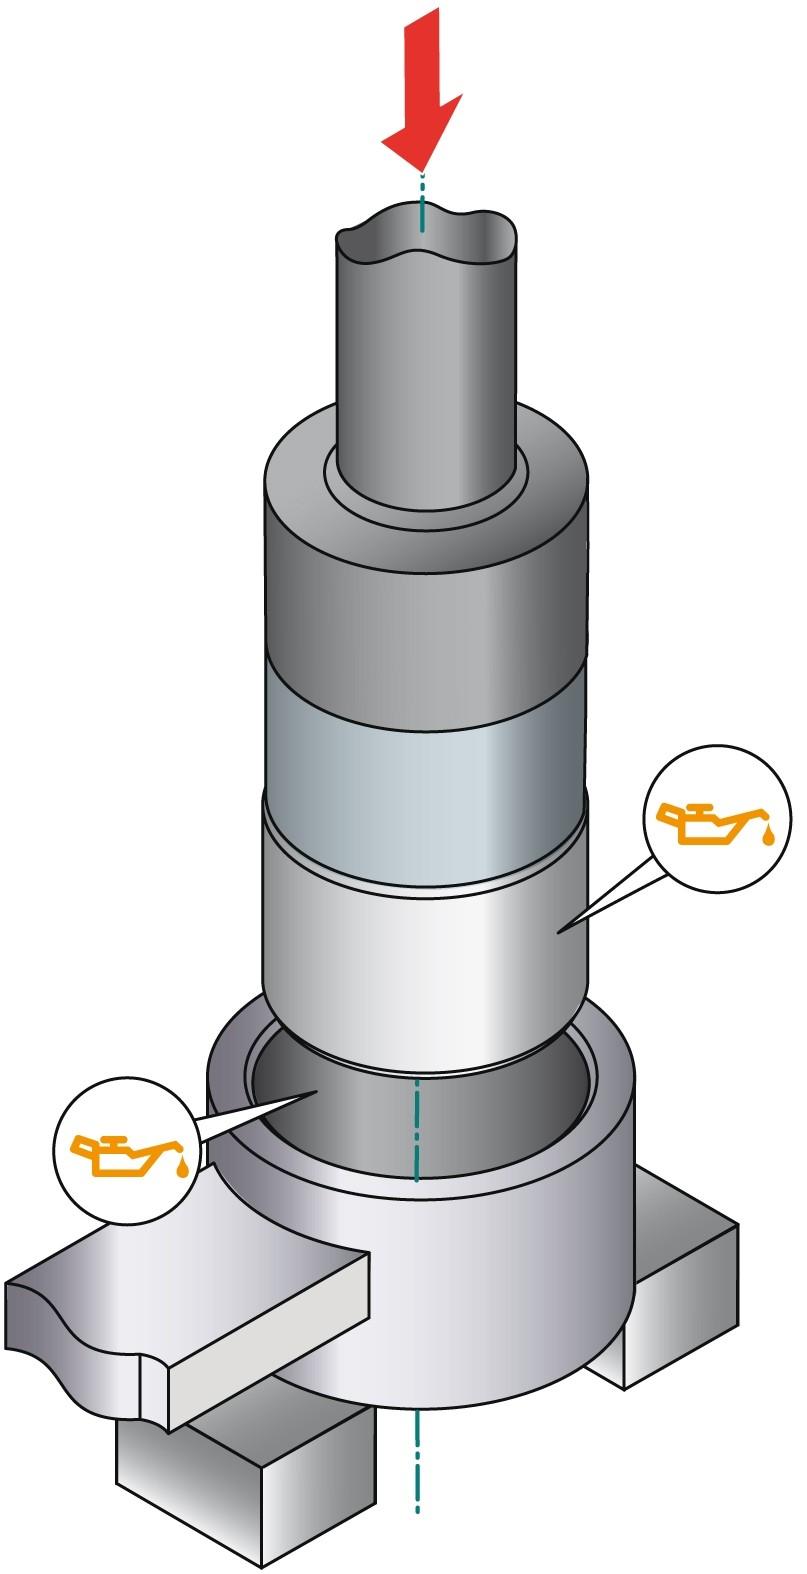 obraz montaż tulei metal-guma-metal 2